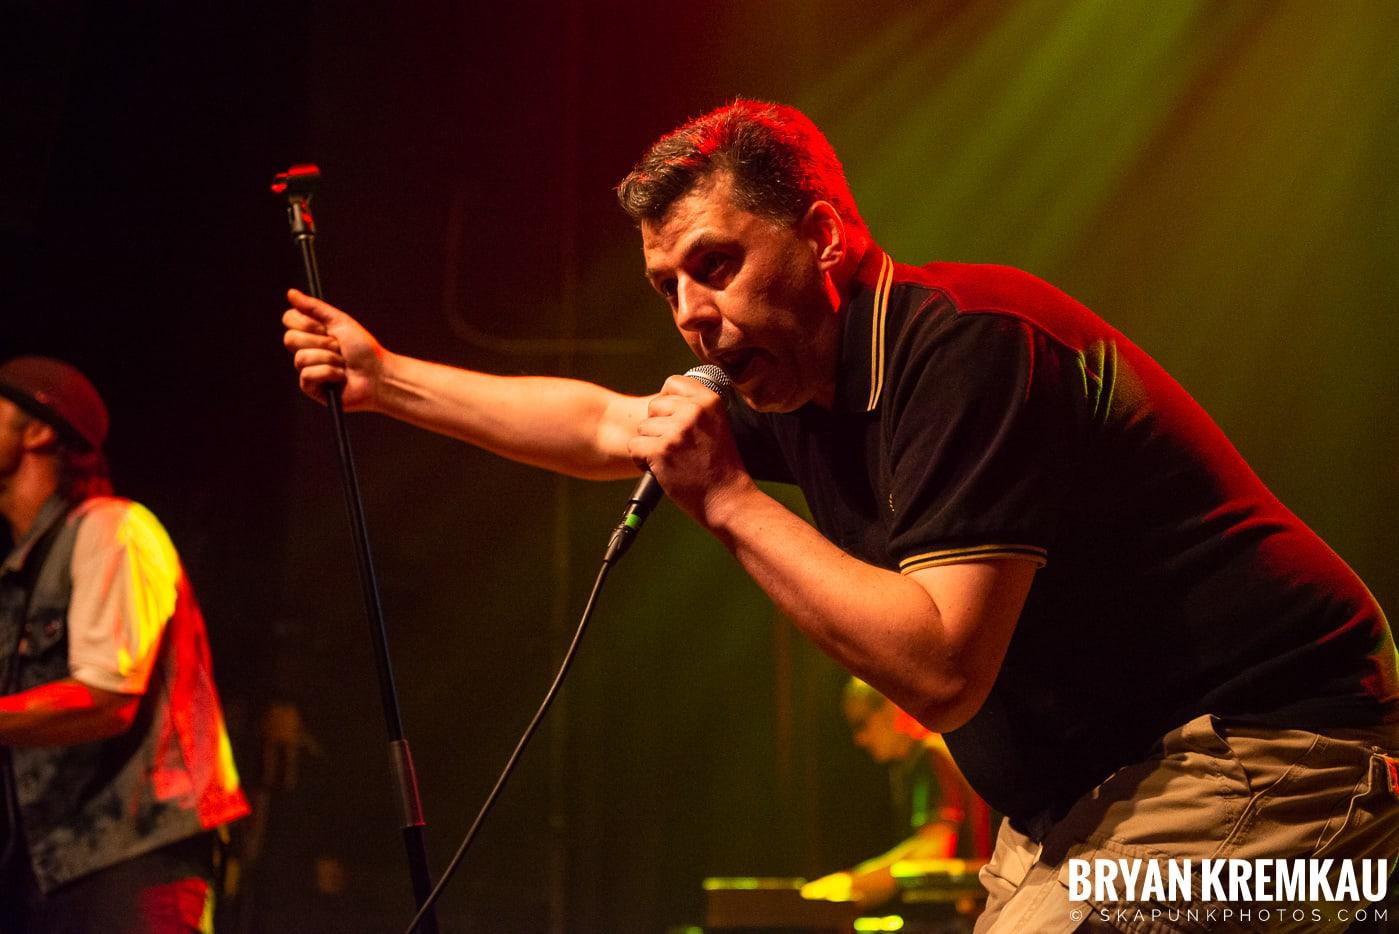 Spring Heeled Jack @ Radicsfest, Gramercy Theatre, NYC - 7.19.19 (3)